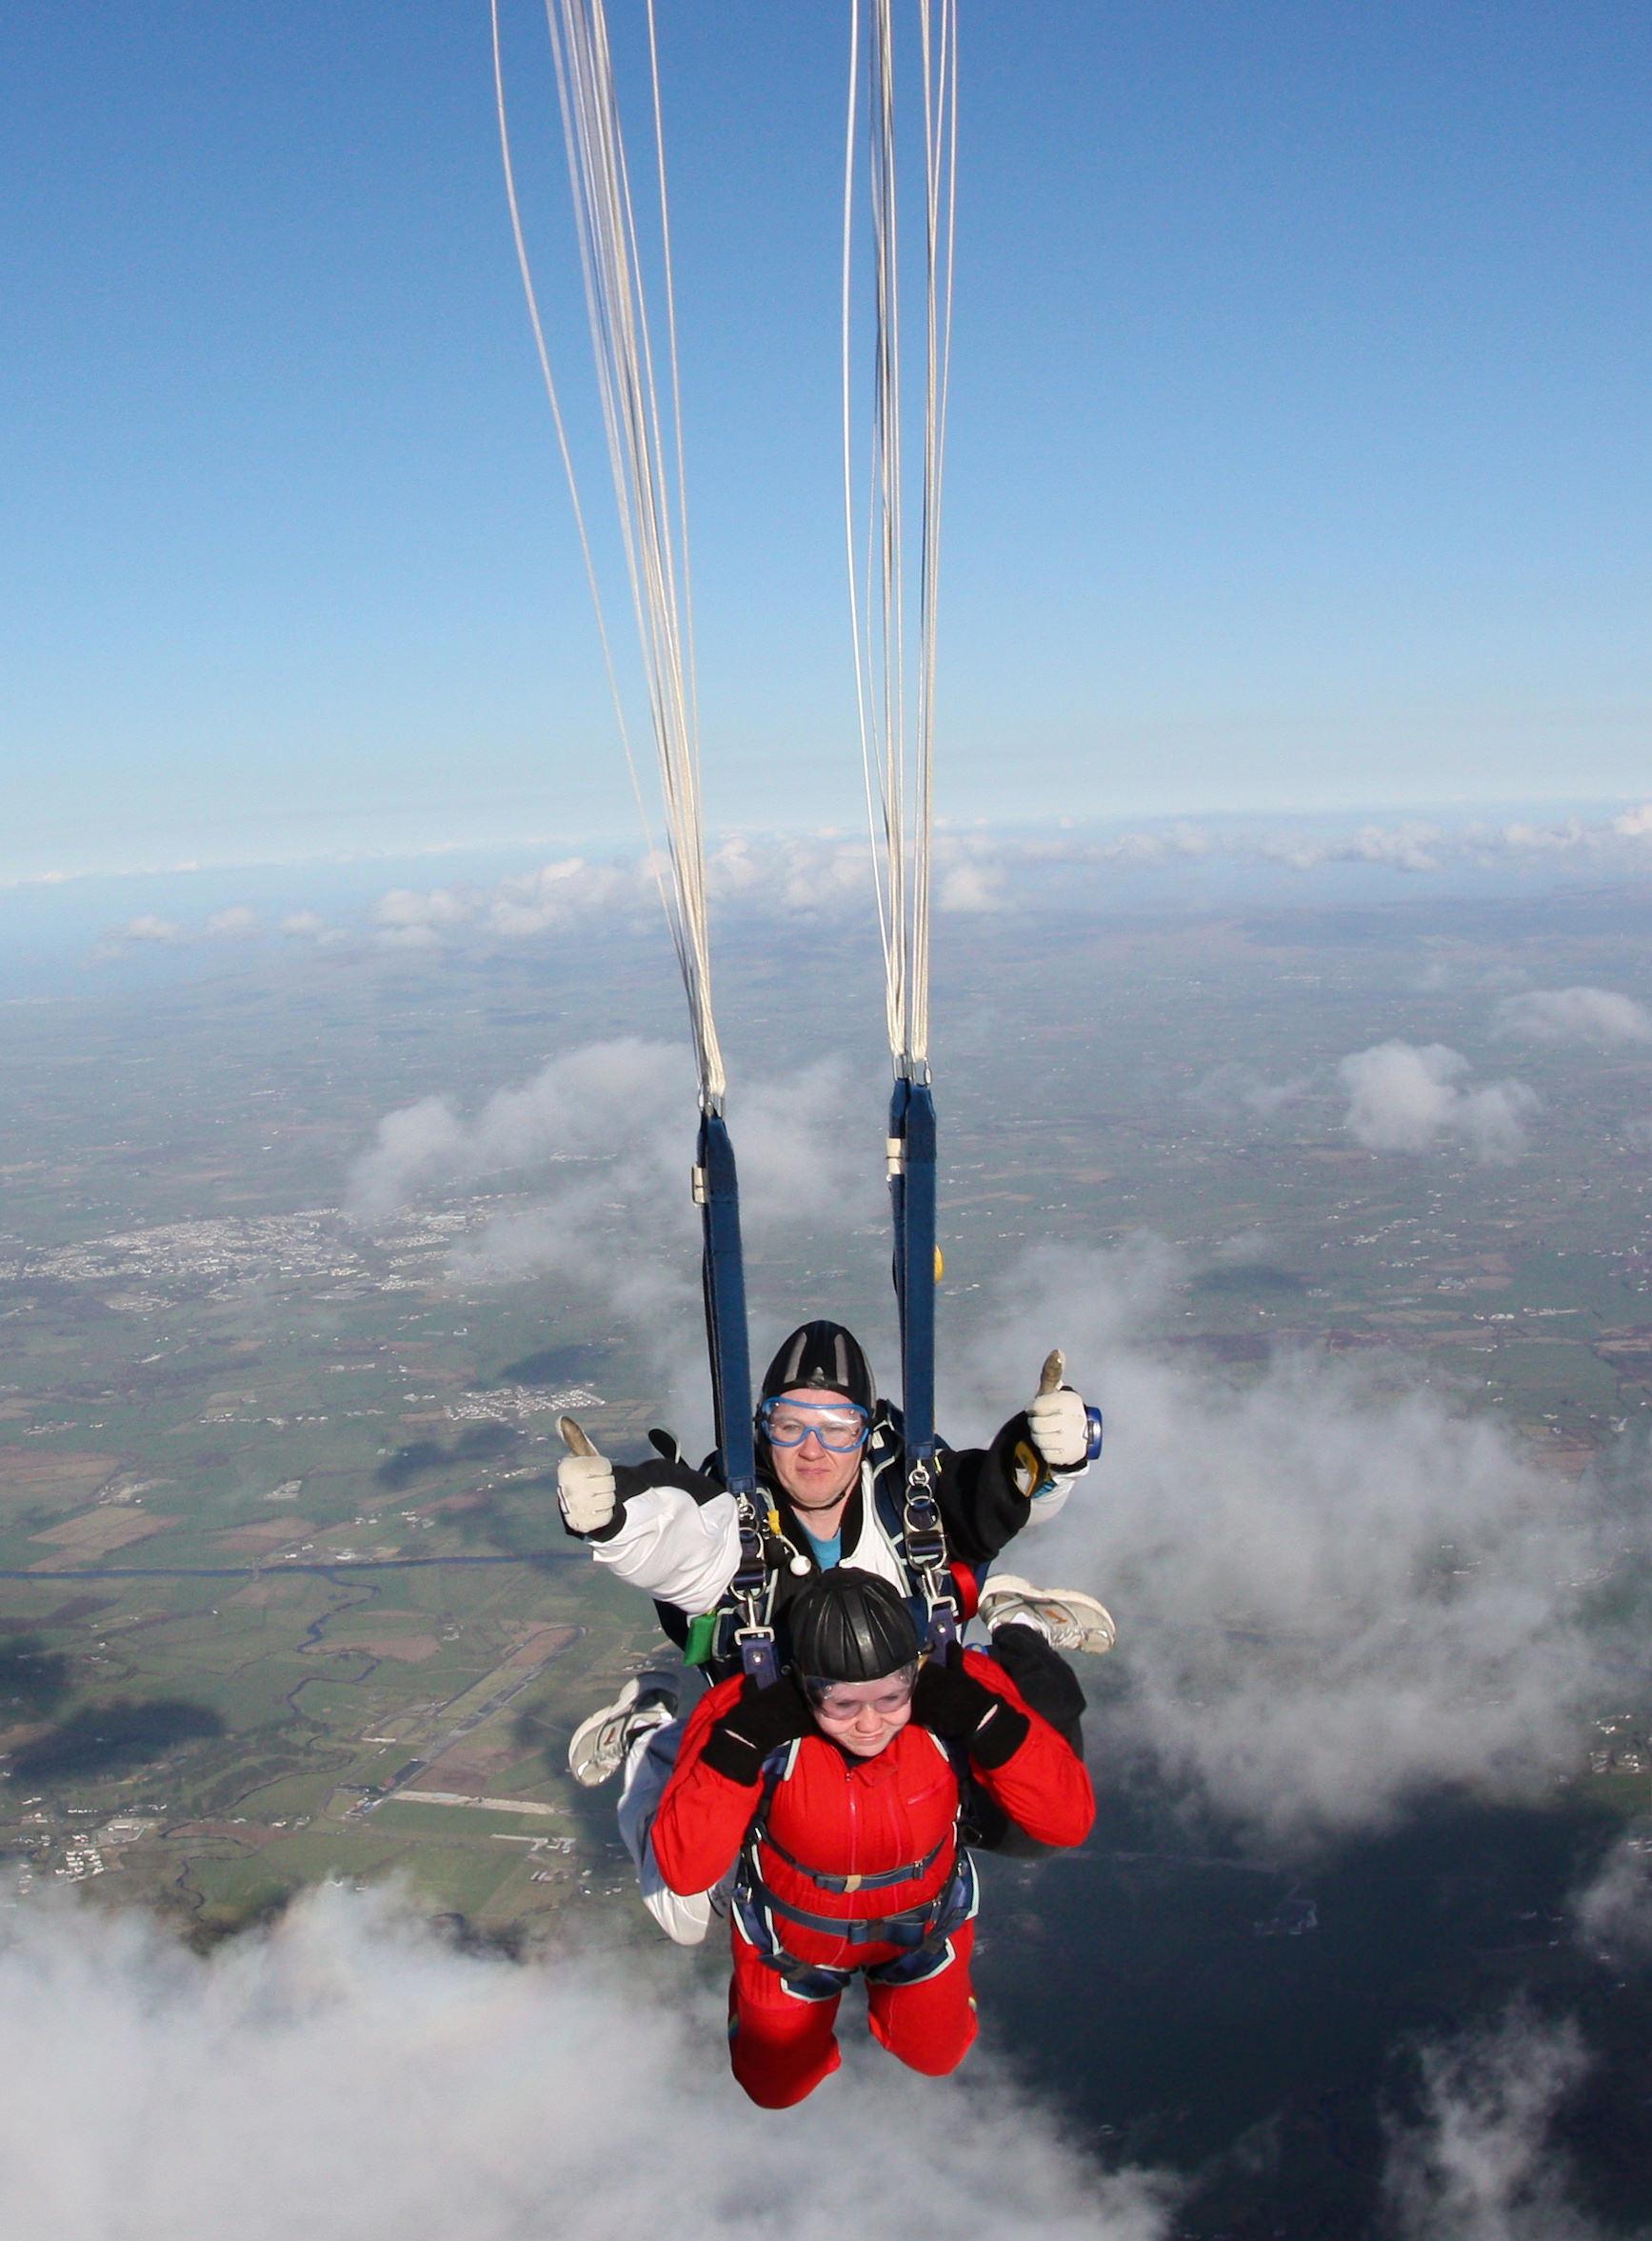 Skydiving Photography Techniques Ephotozine